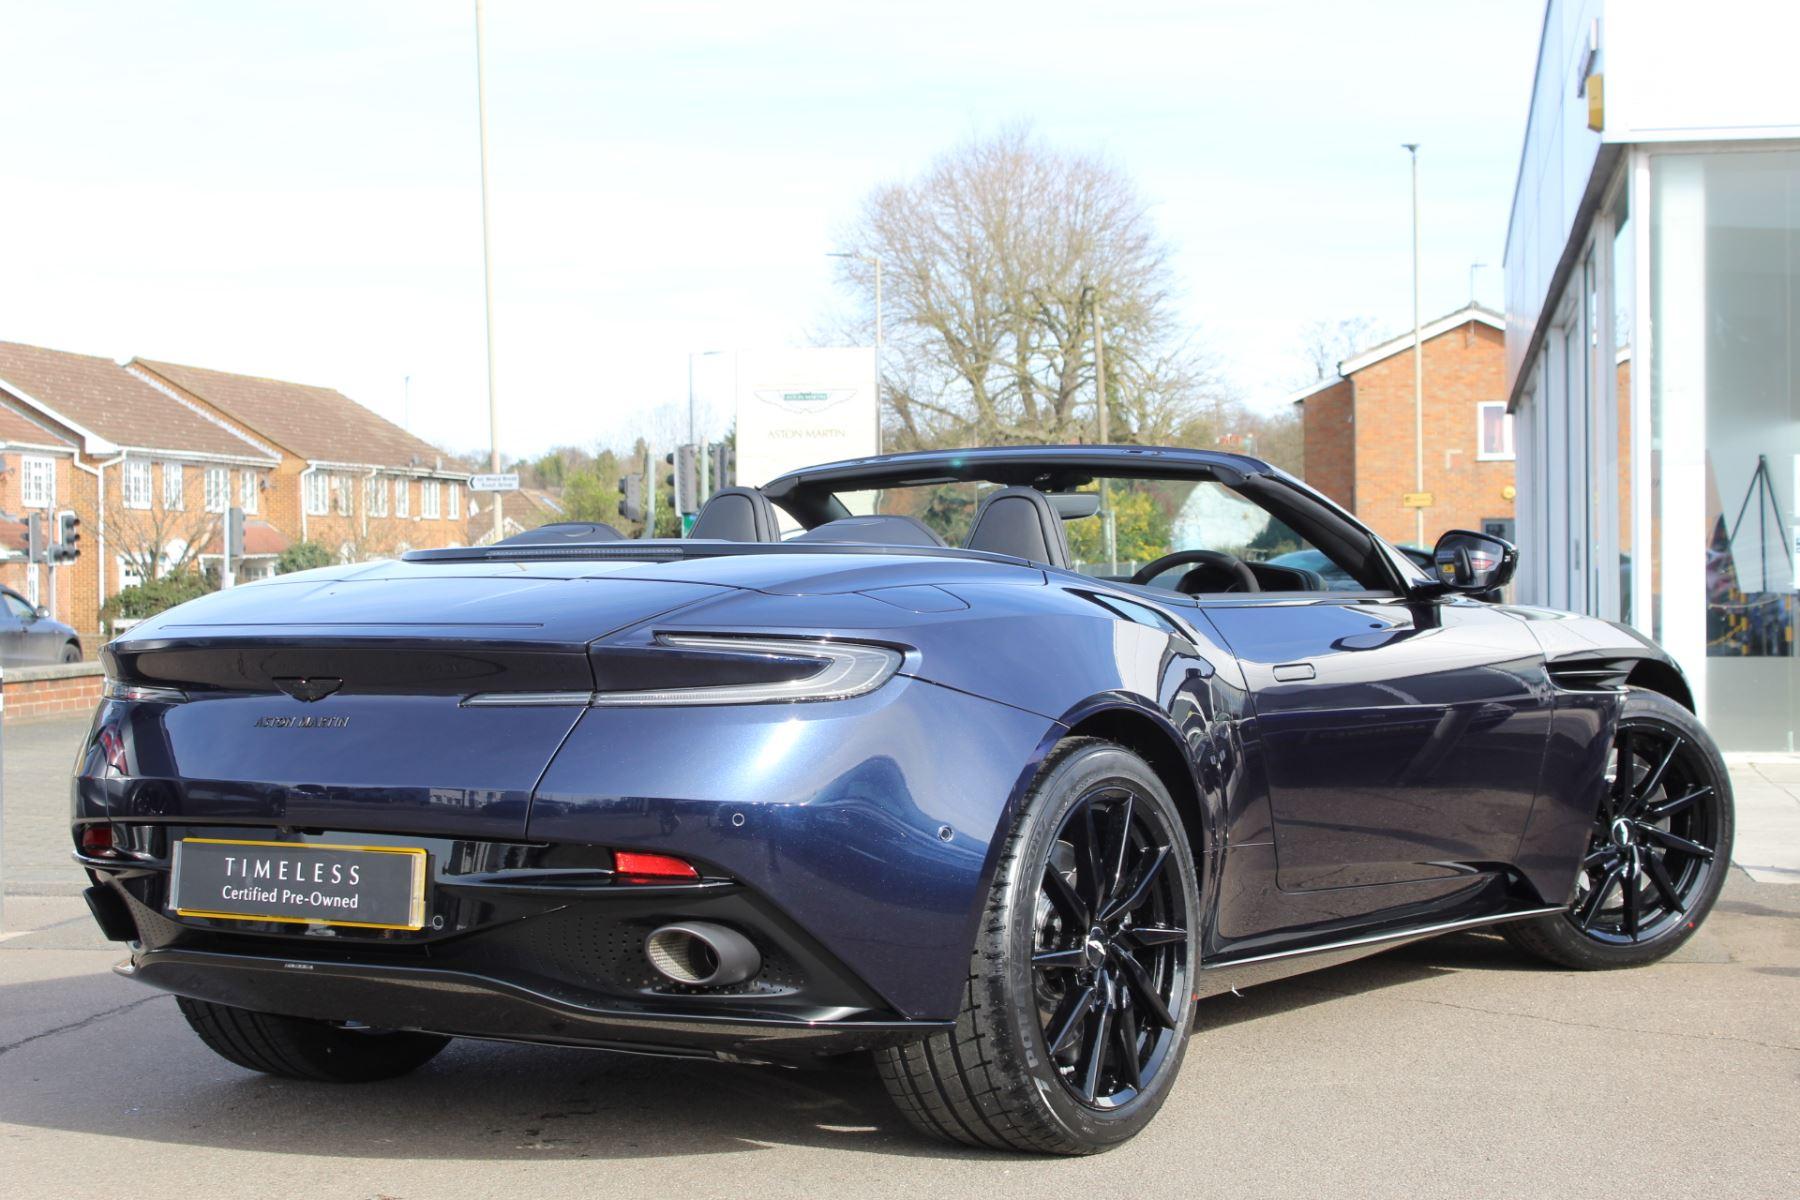 Aston Martin DB11 Volante V8 Volante 2dr Touchtronic image 2